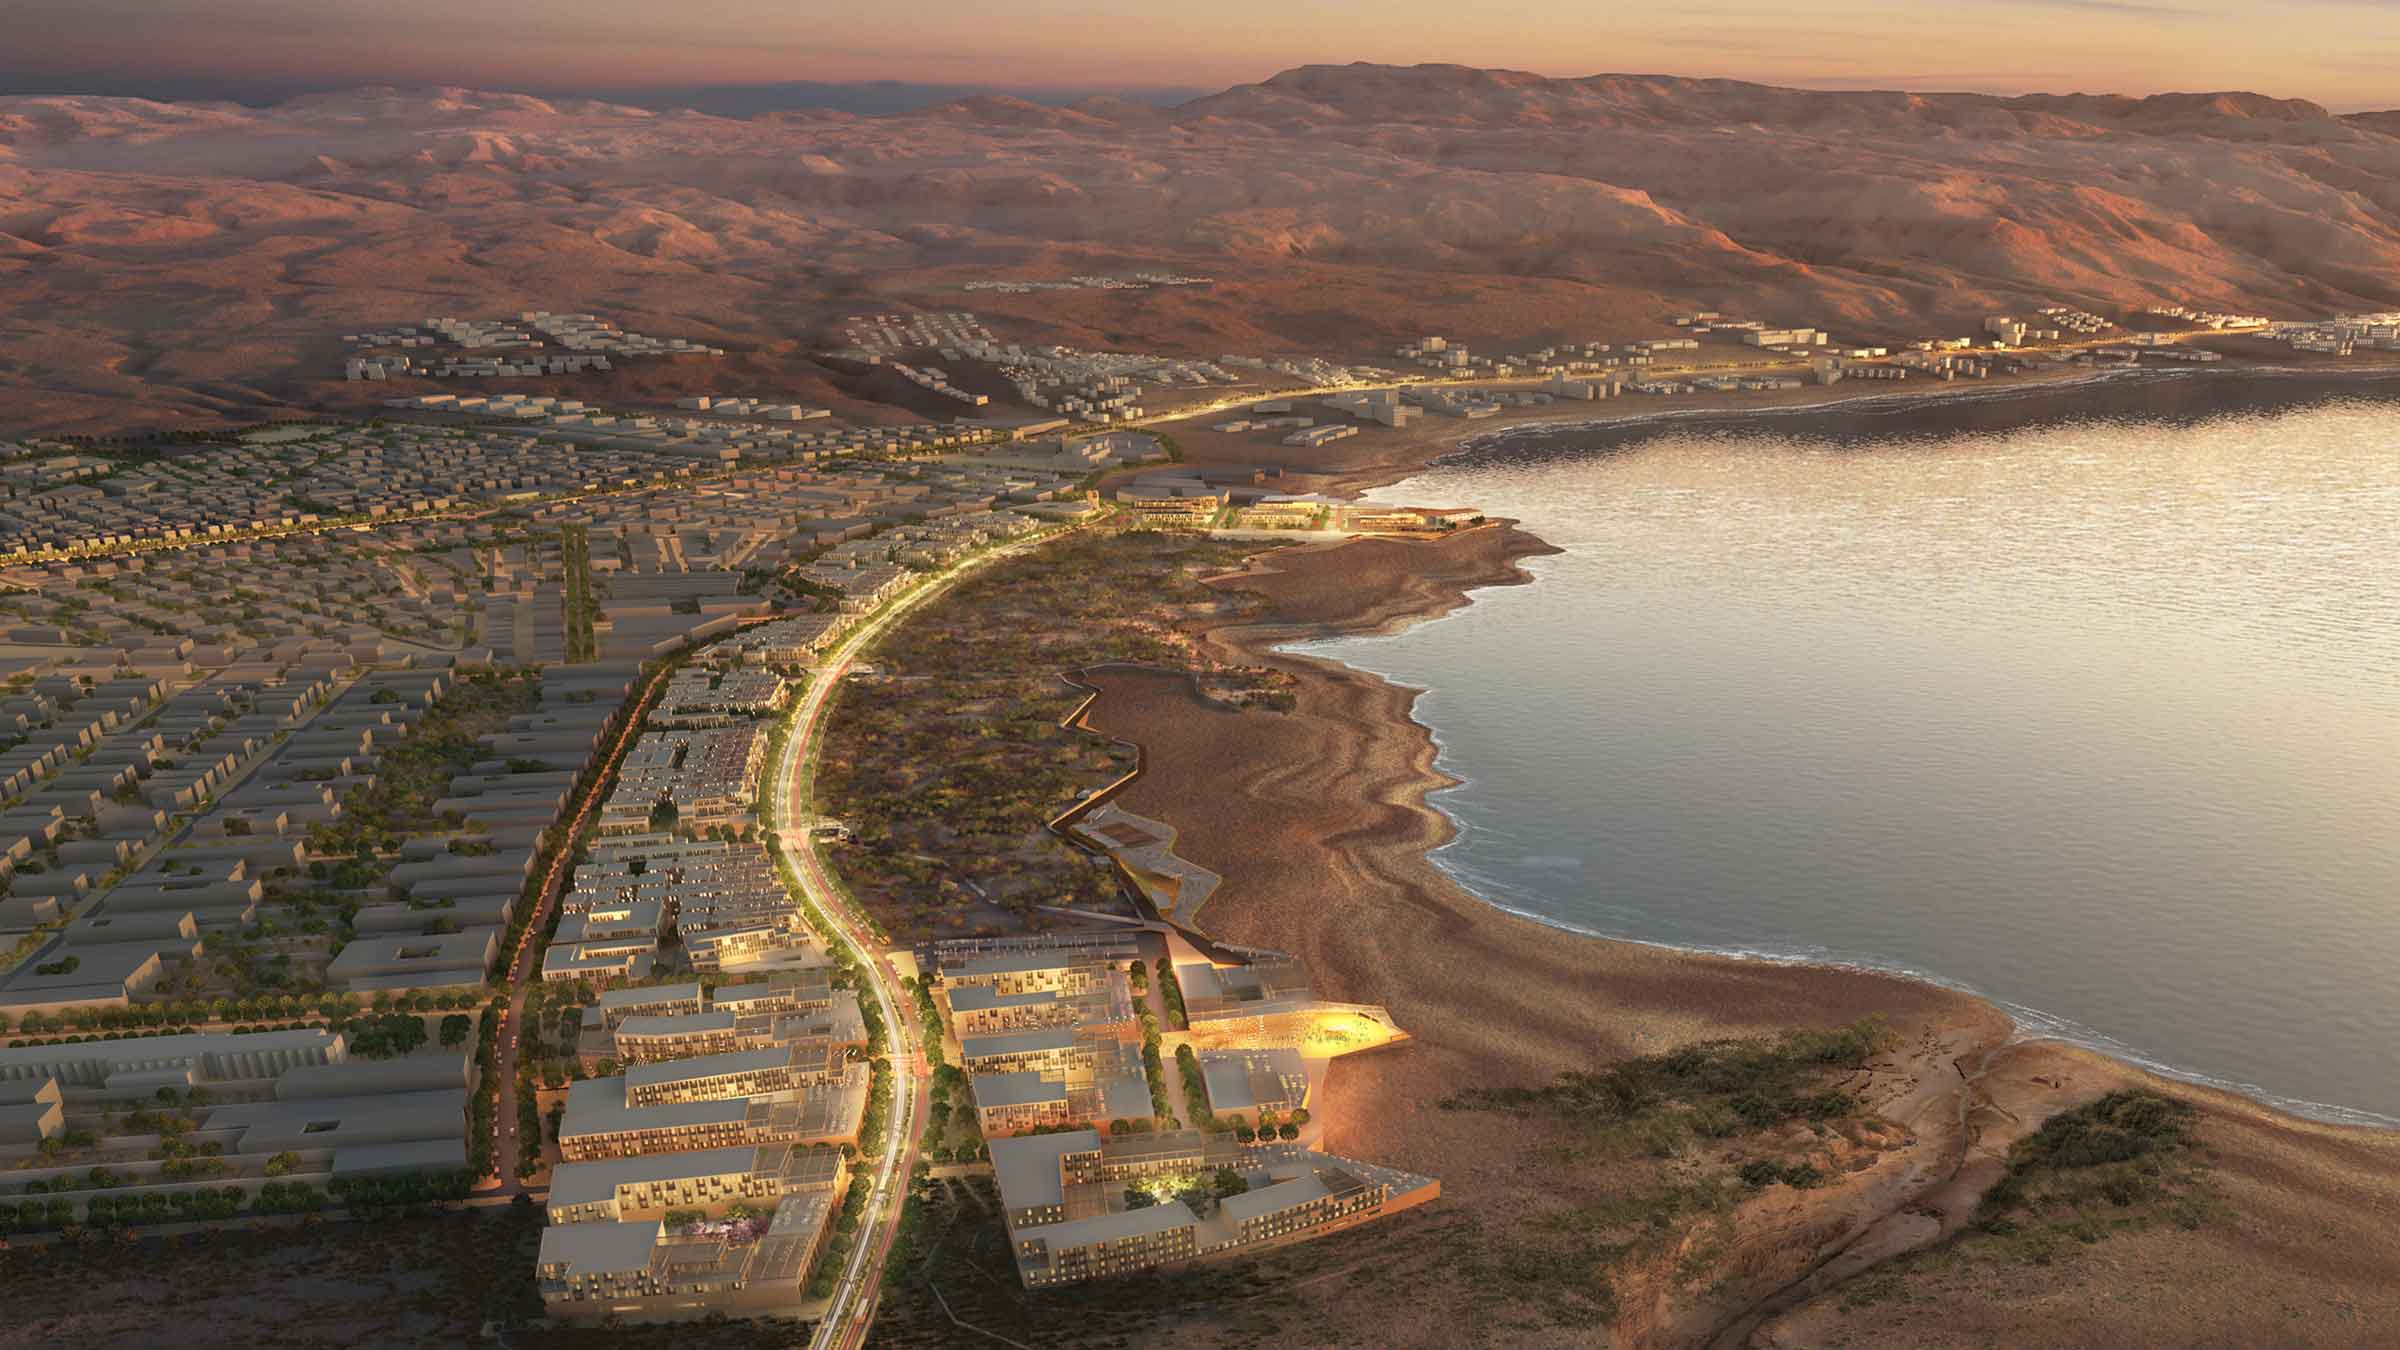 Dead Sea Corniche District, Sweimeh, Jordan. Rendering courtesy Sasaki Associates.